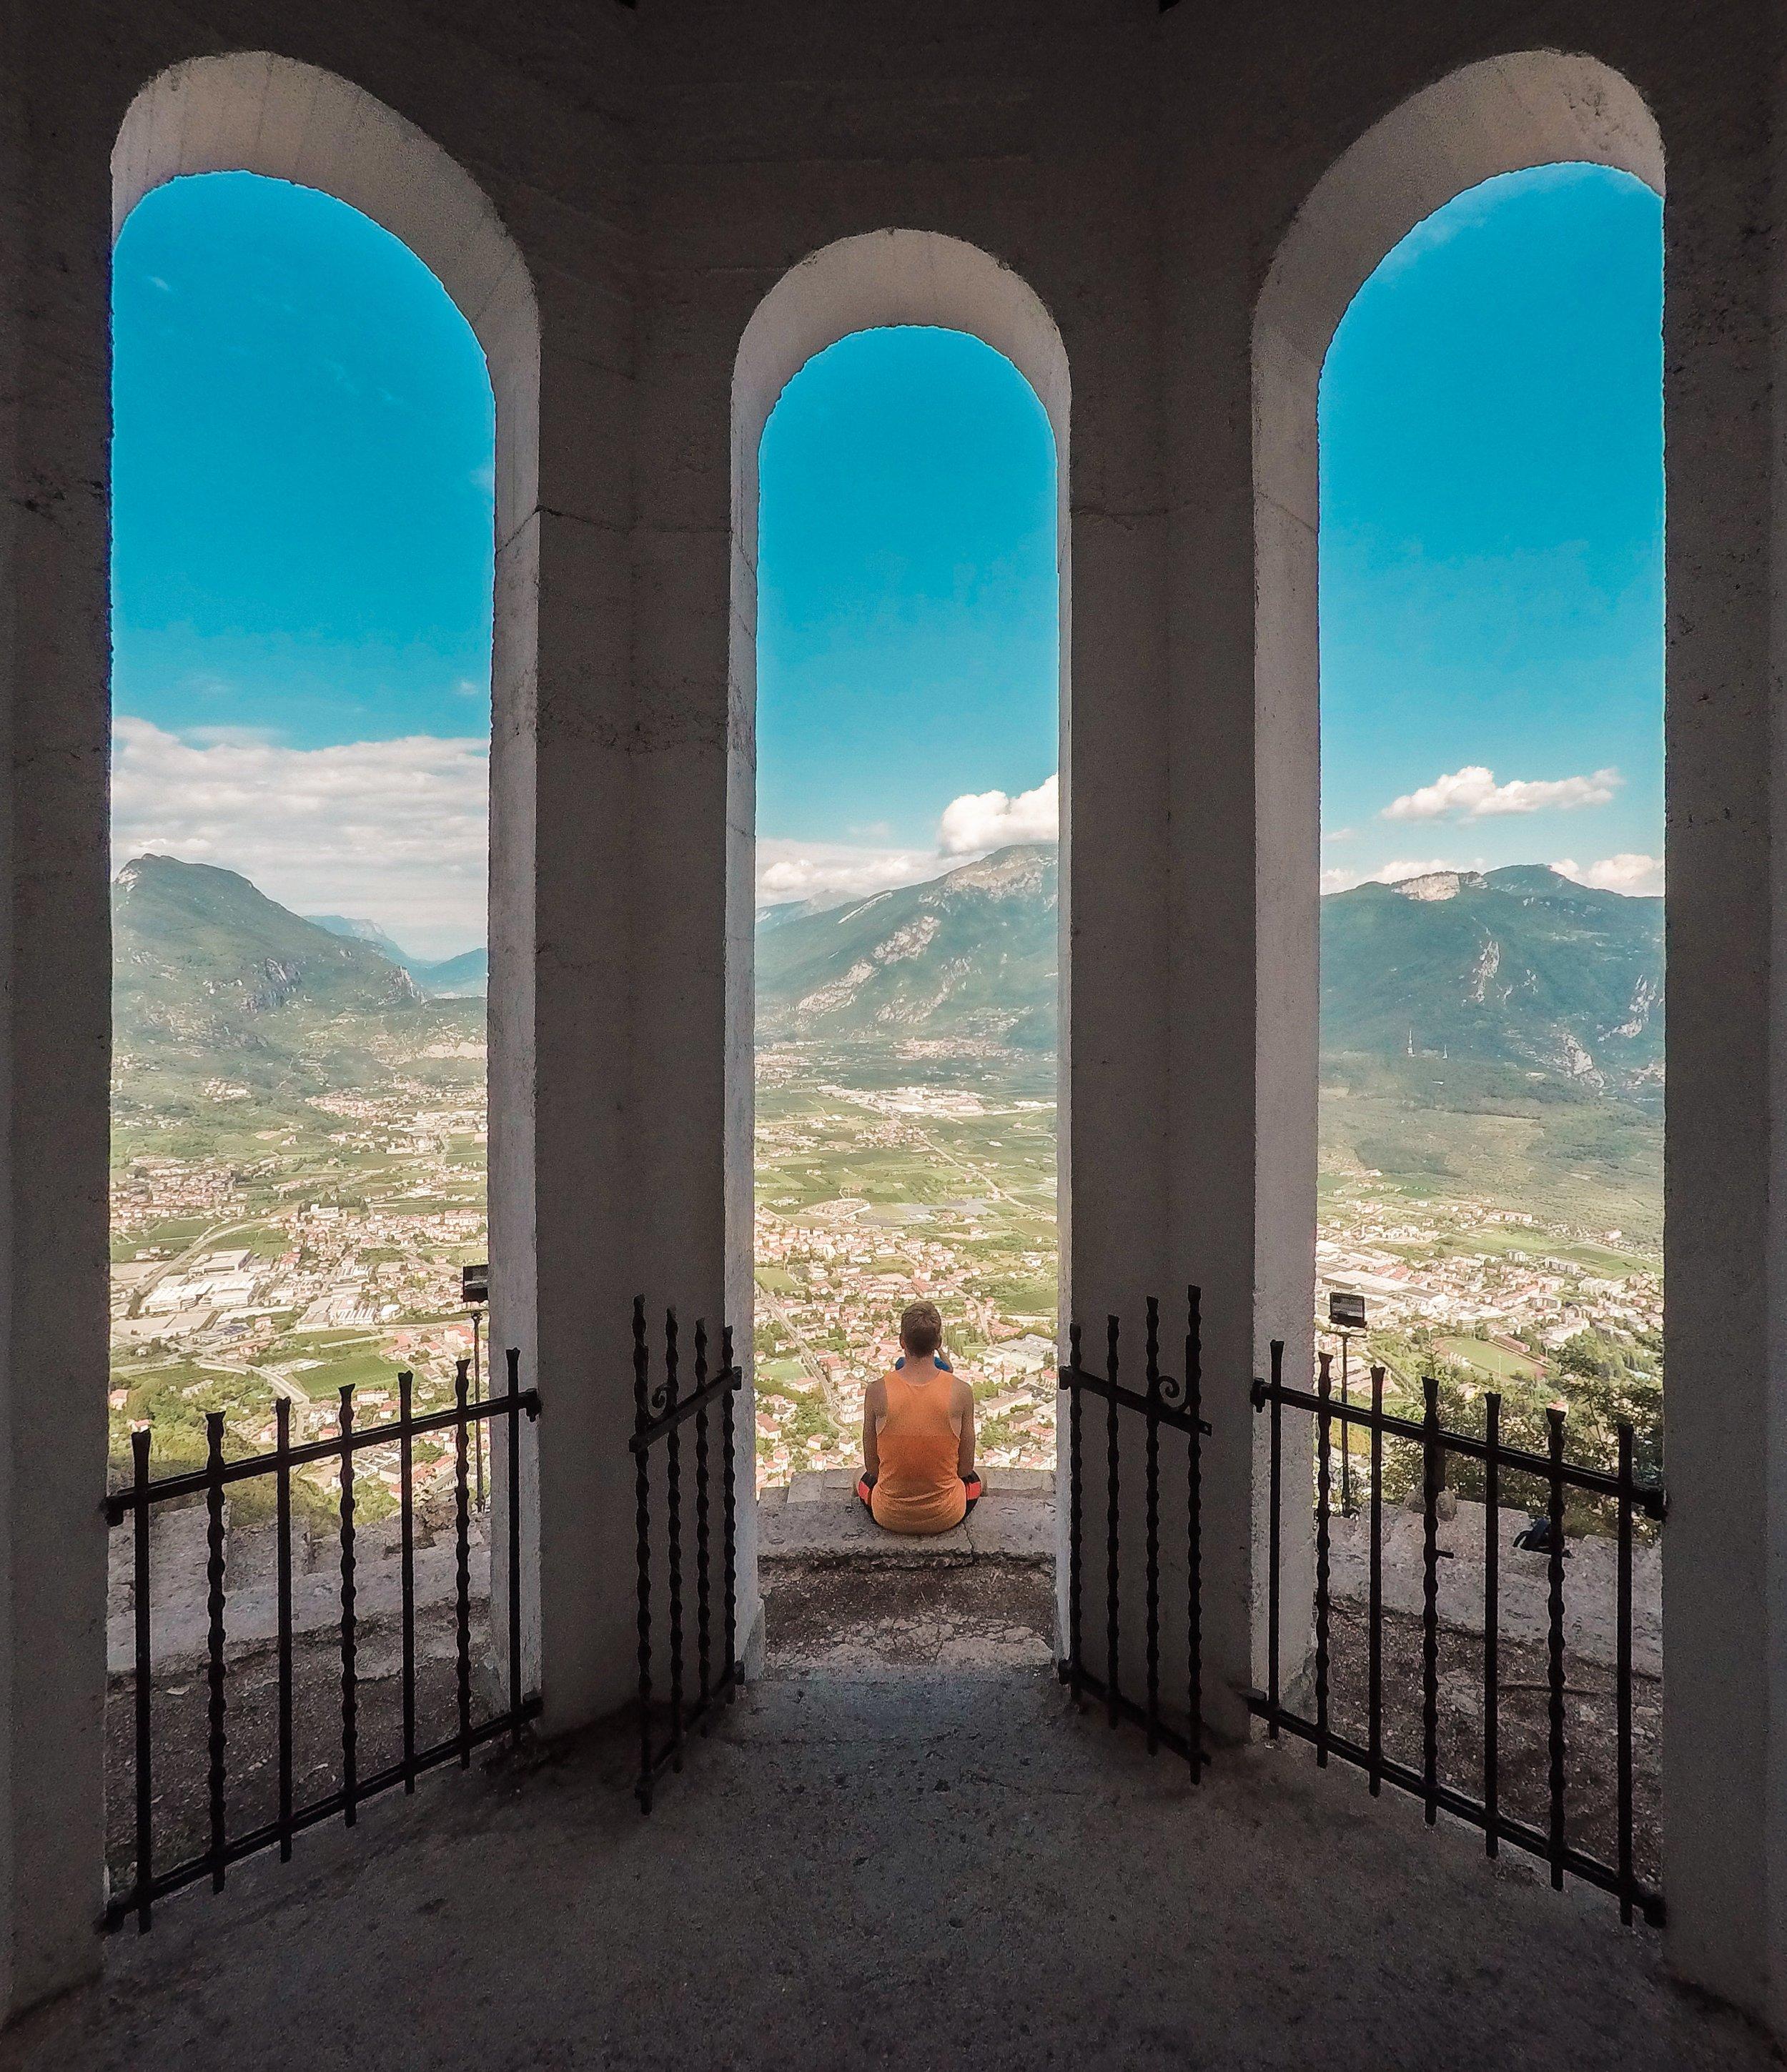 Those Lake Garda views tho.....